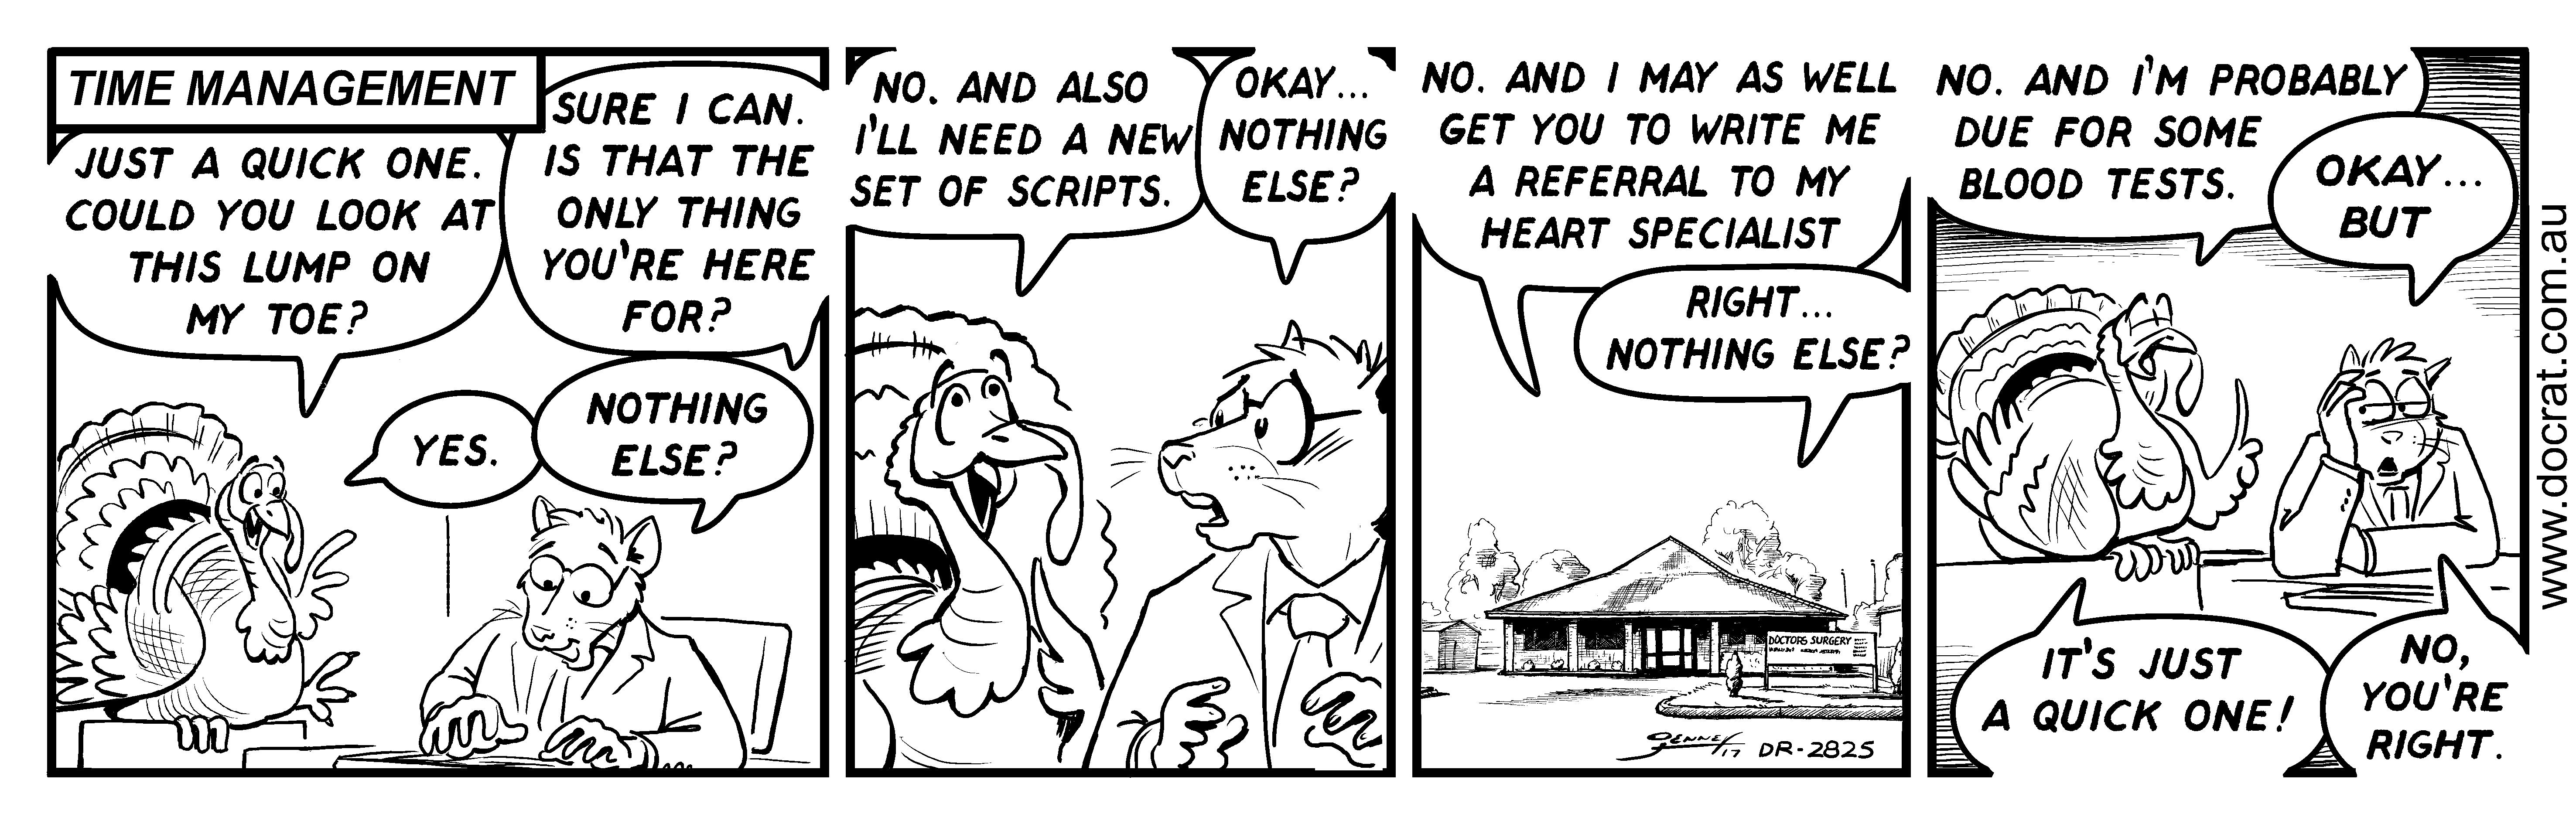 20170721